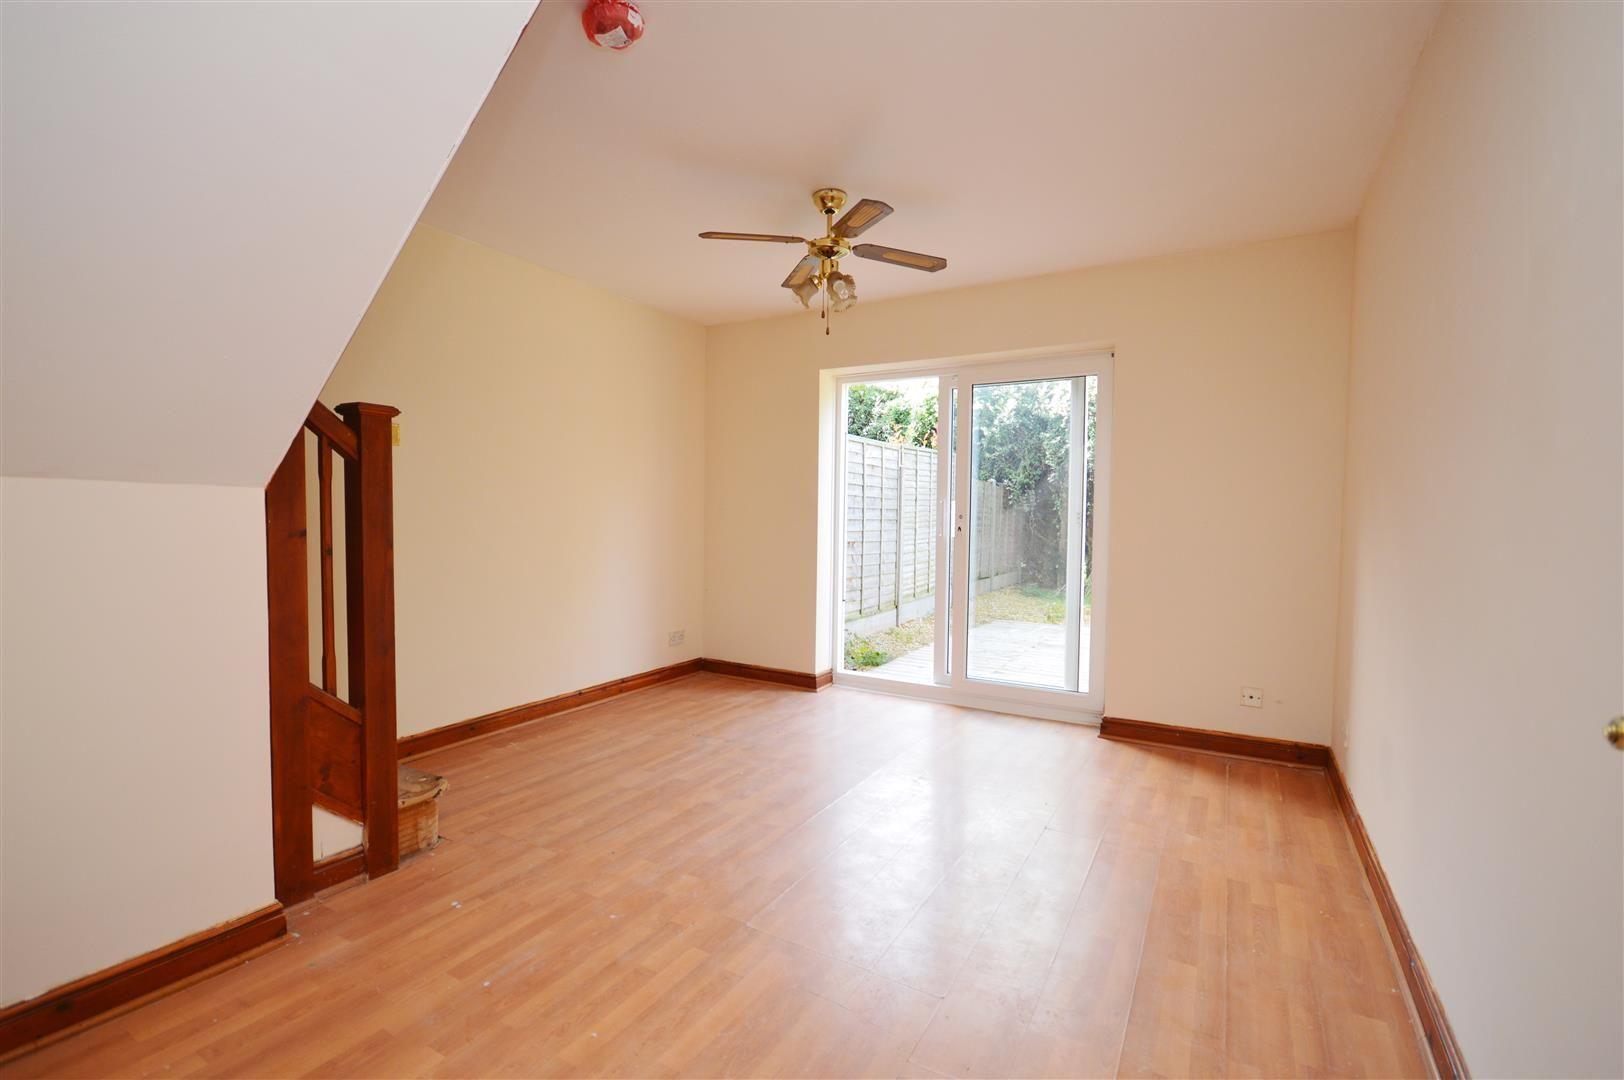 2 bed terraced for sale in Lower Bullingham 3